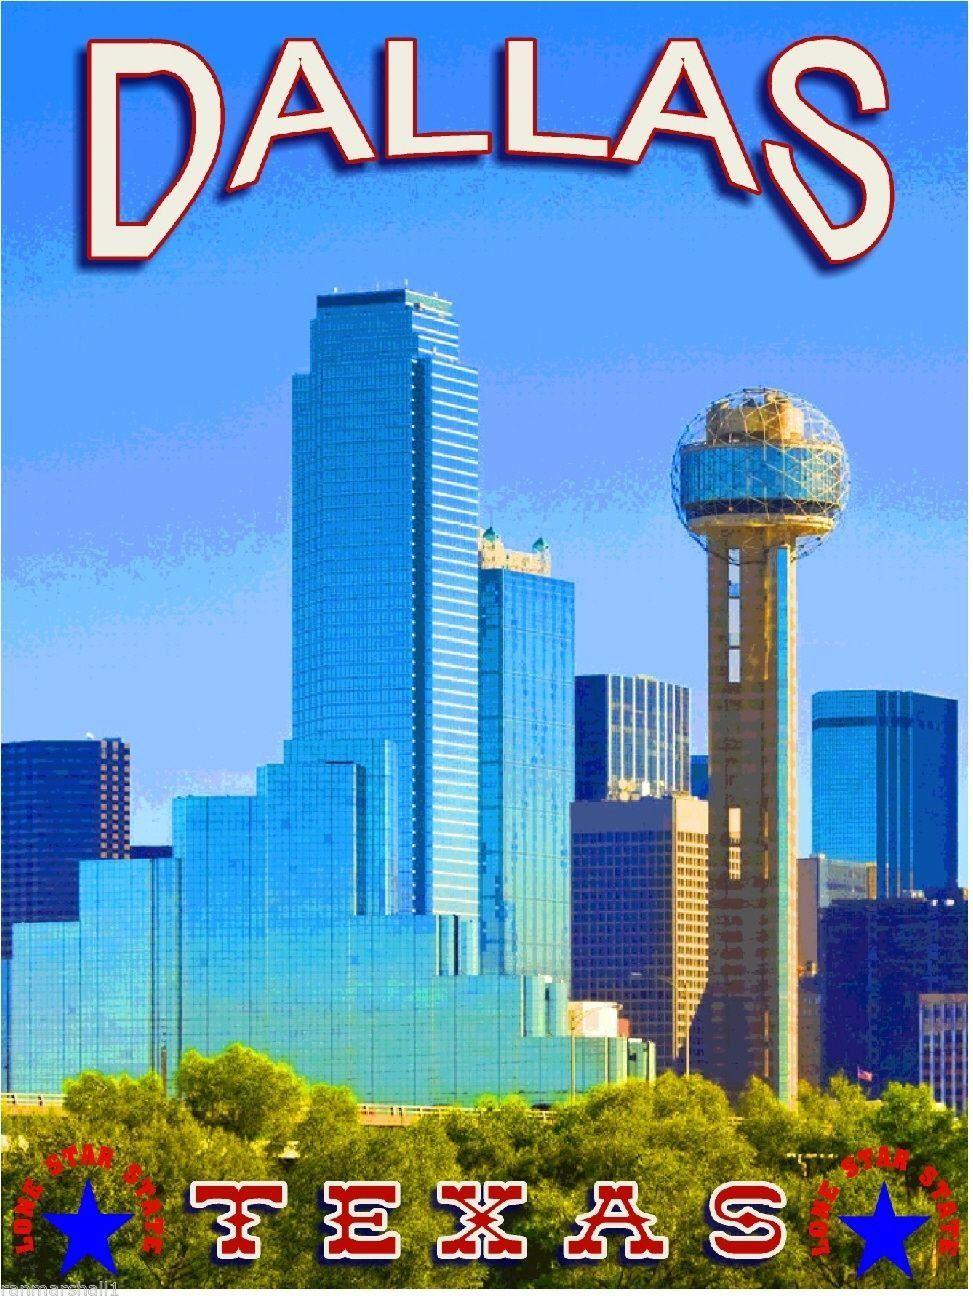 Dallas Texas Skyline United States of America Travel Art